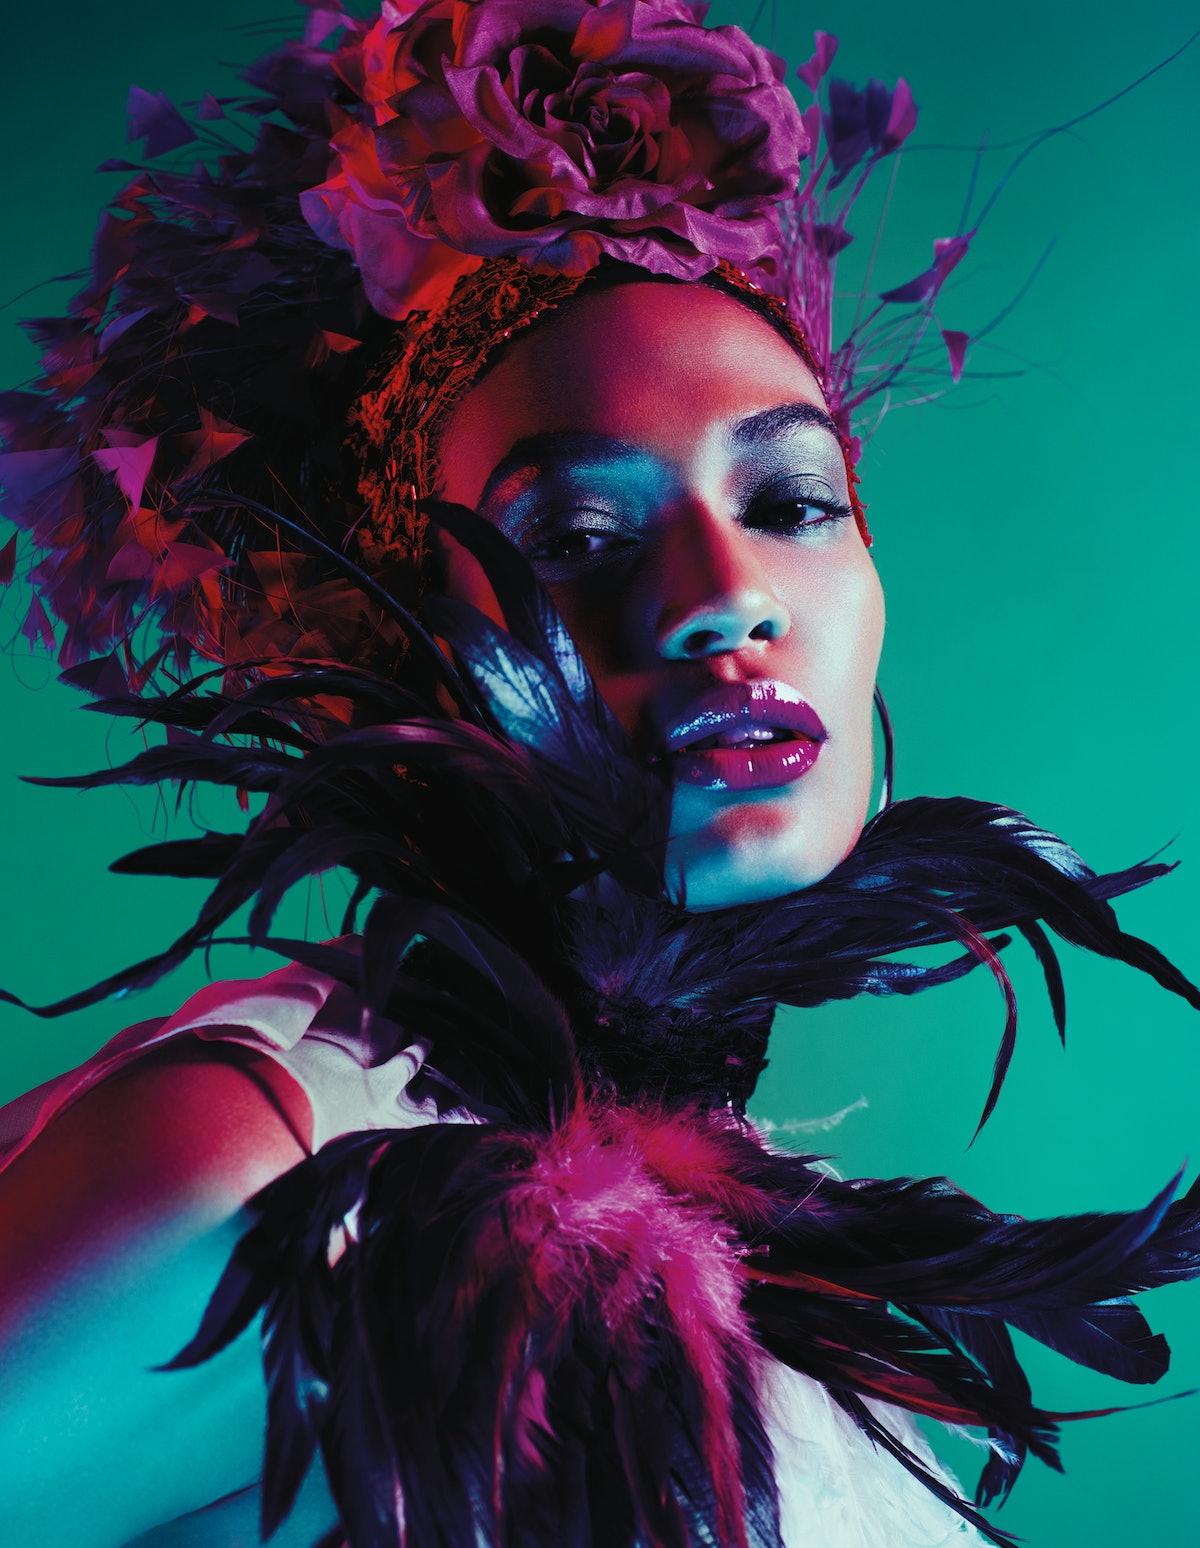 Tom Ford's ostrich feather top. M&S Schmalberg Inc. silk flowers; Kokin headband; Jennifer Behr veil...